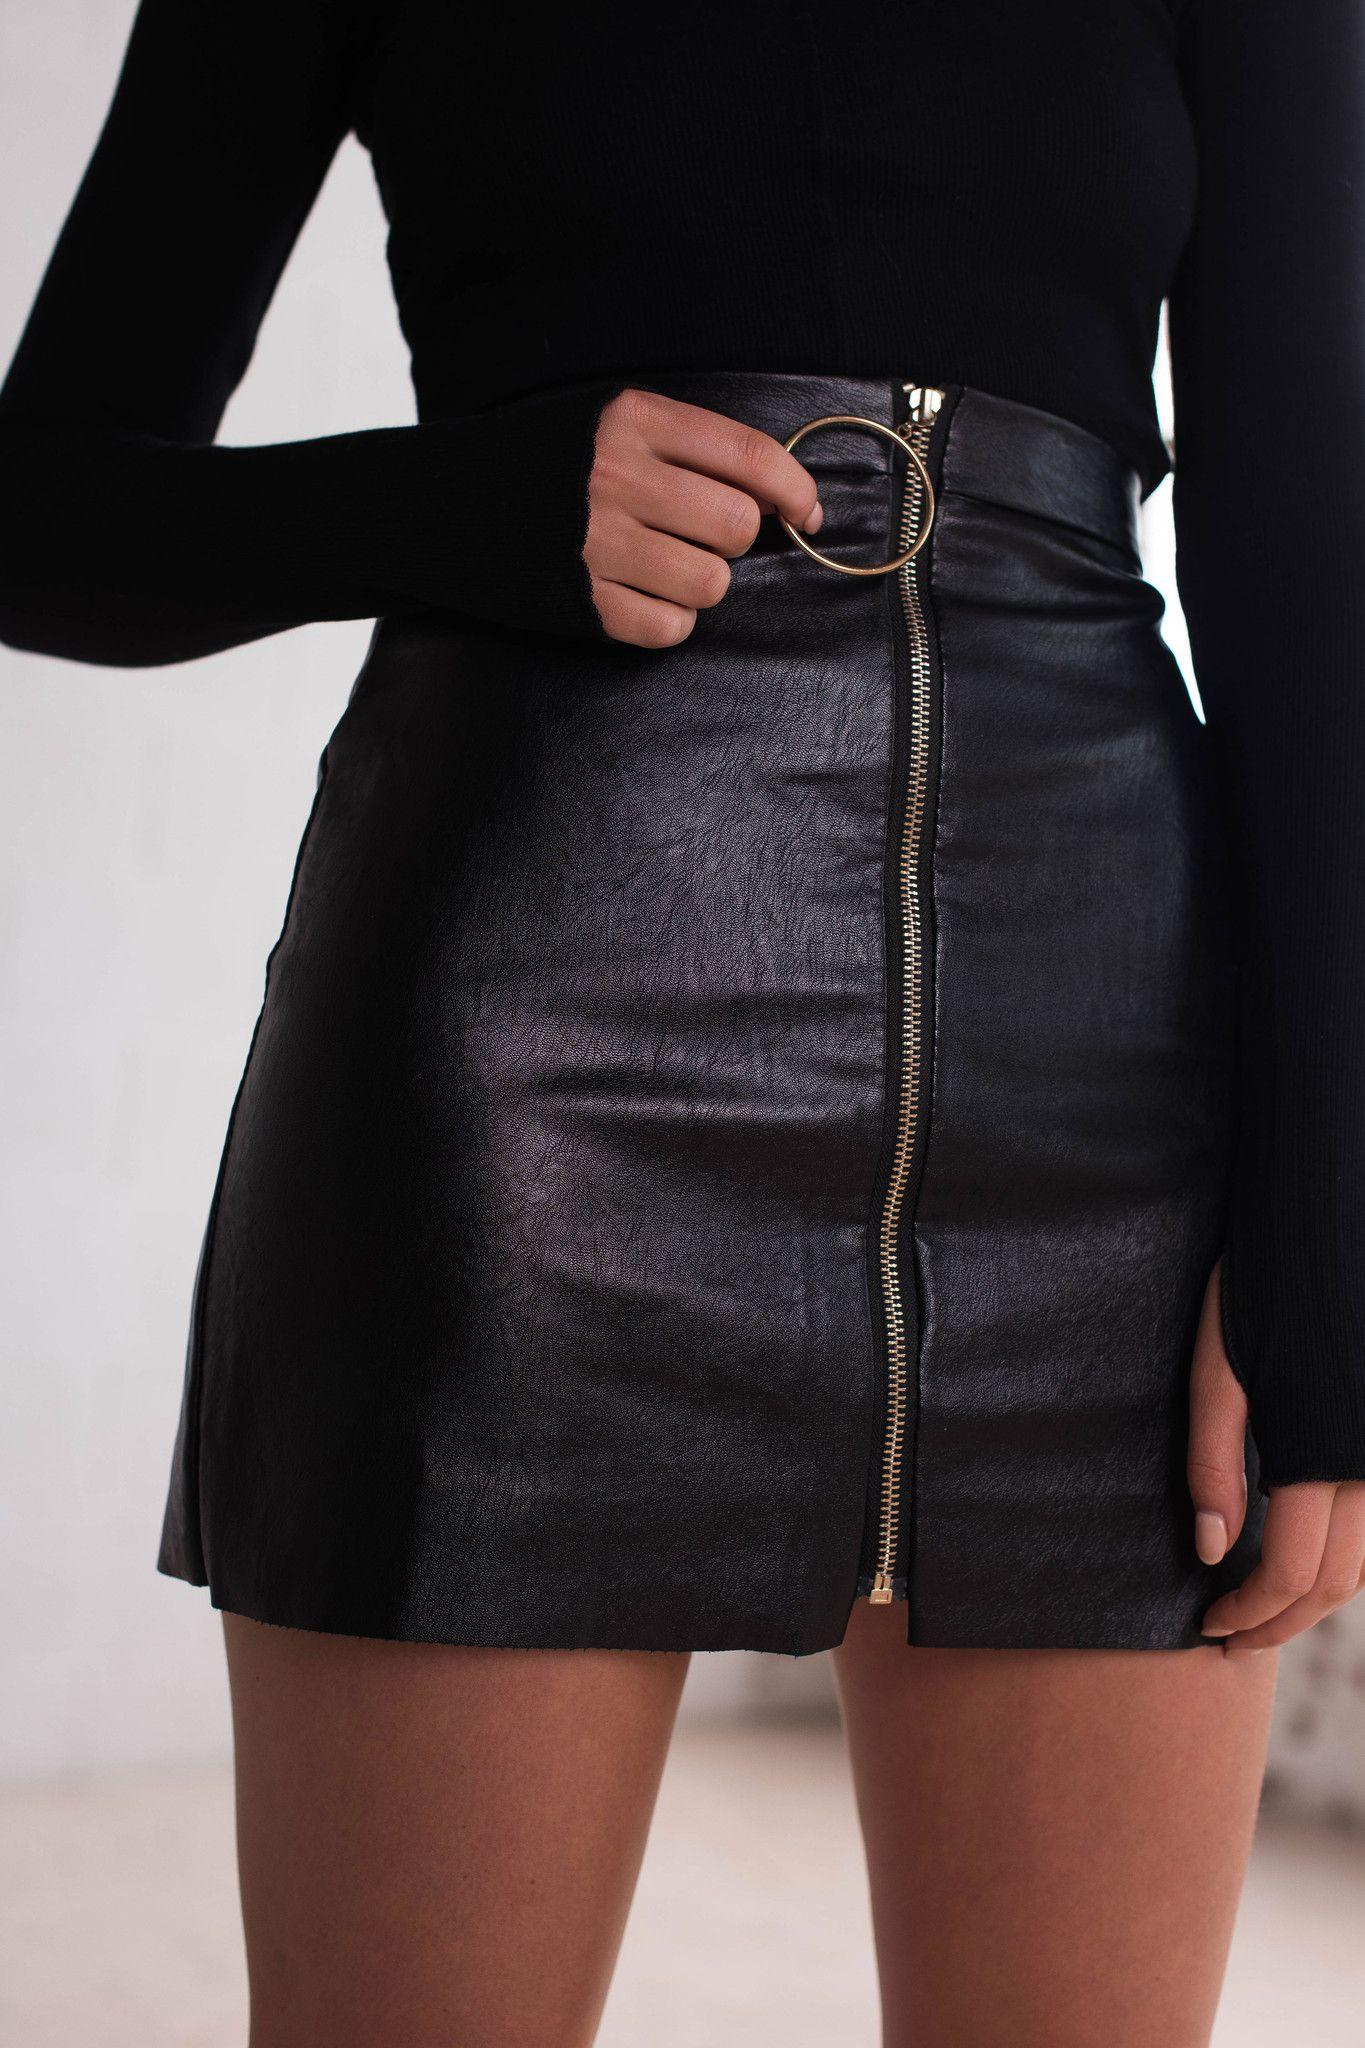 b6fbbca28 Stone Fox Skirt | Black - Women's Clothing & Fashion Online – Style ...